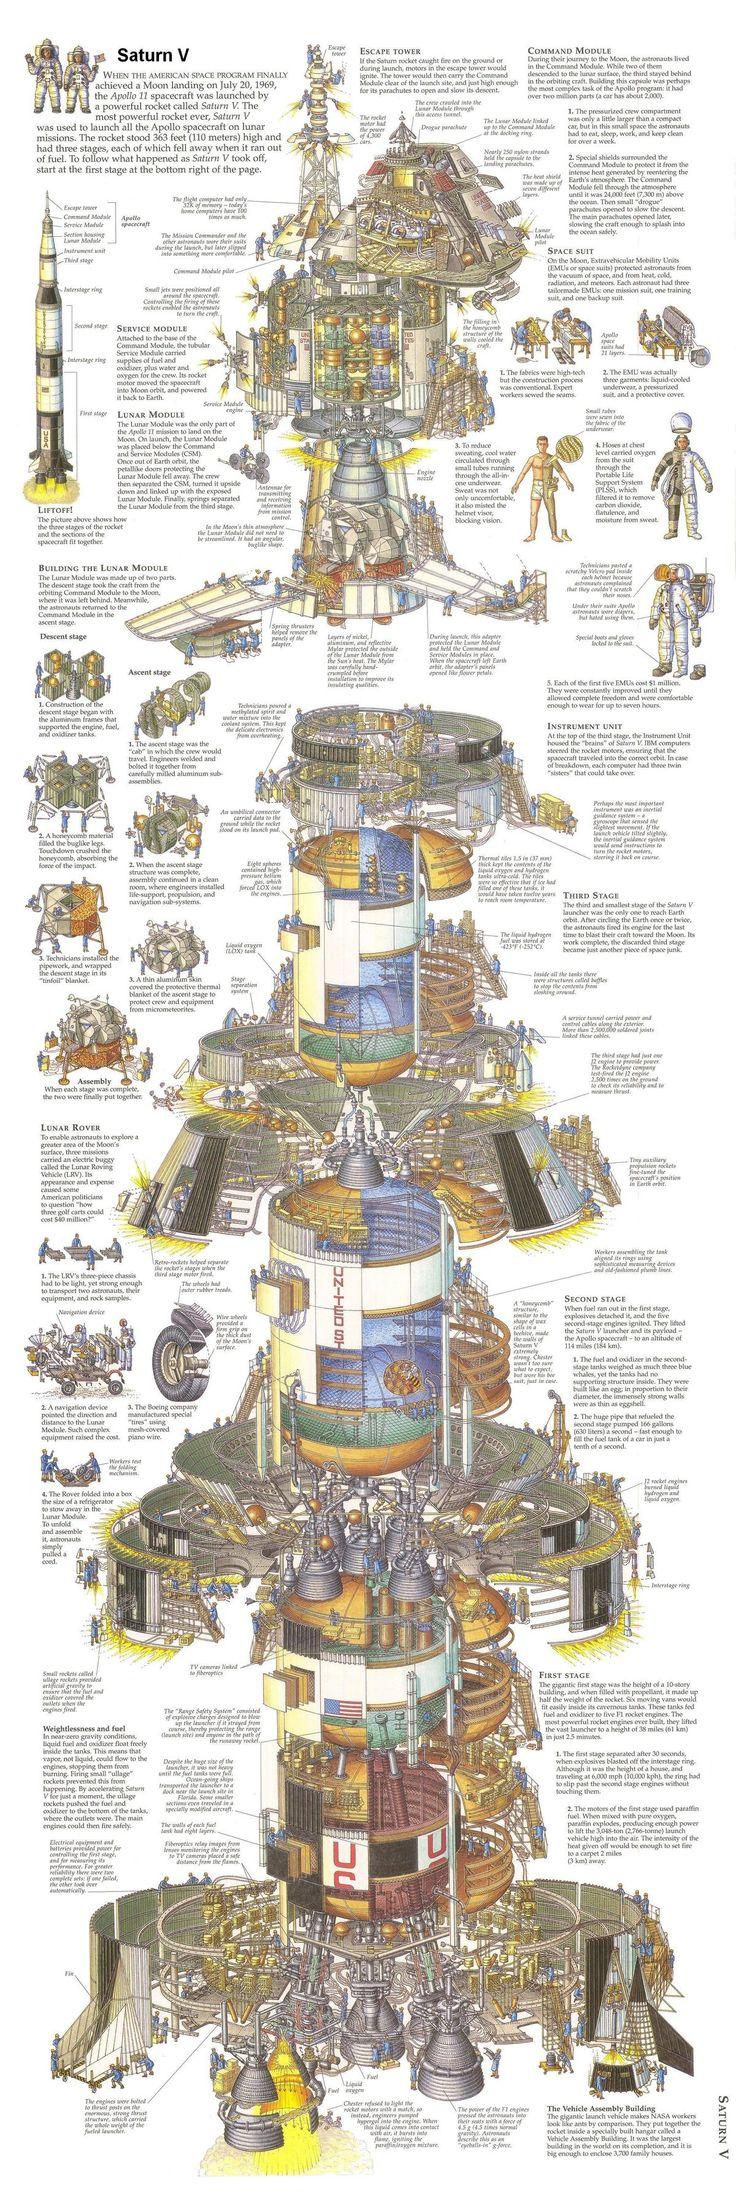 Saturn V Illustration by  Stephen Biesty